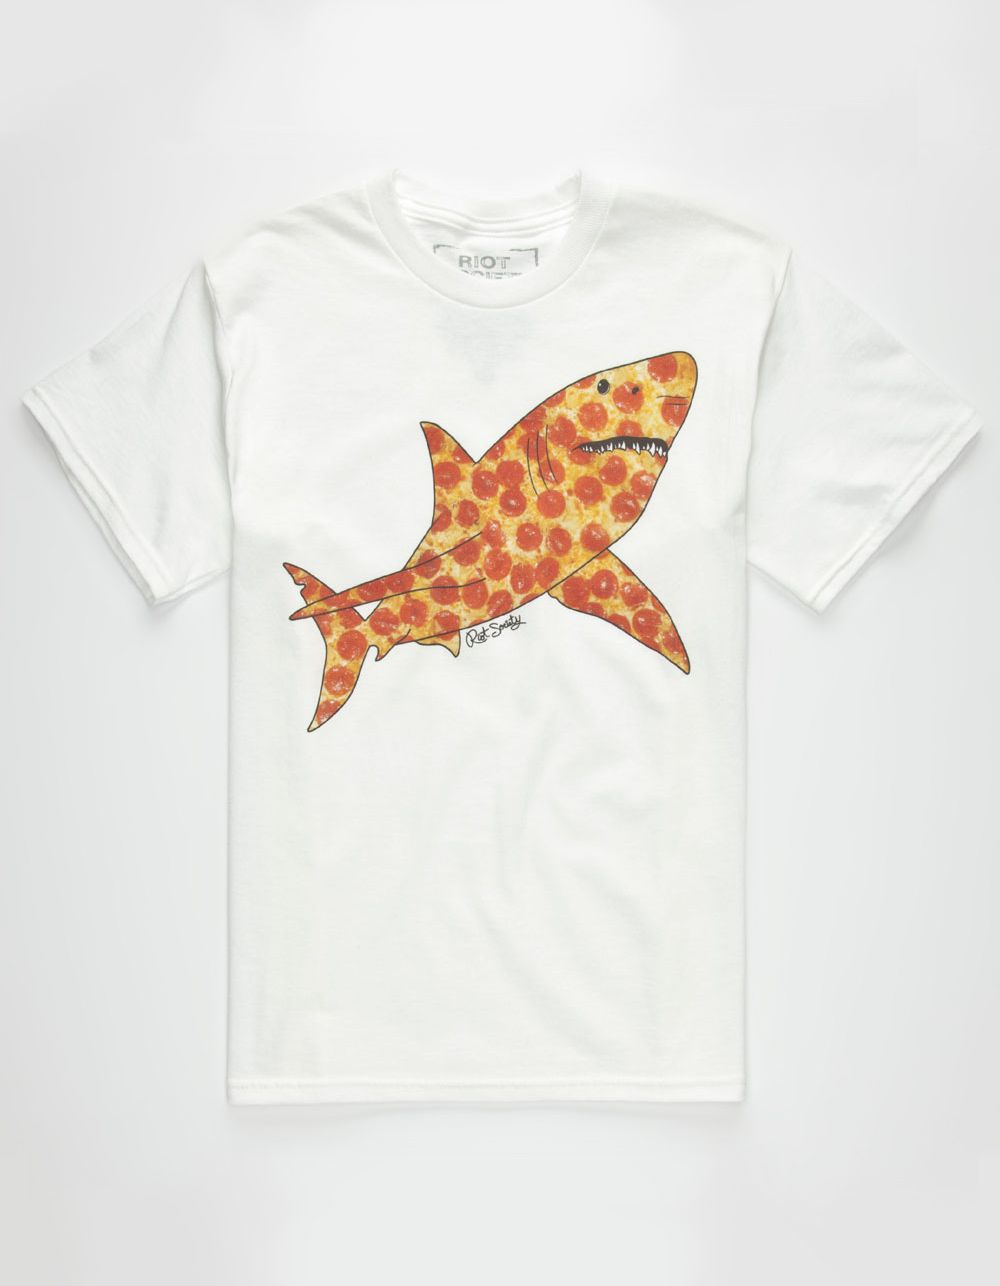 0a28ea3b0f89 Riot Society pizza shark tee. Pizza print shark giraffe graphic ...